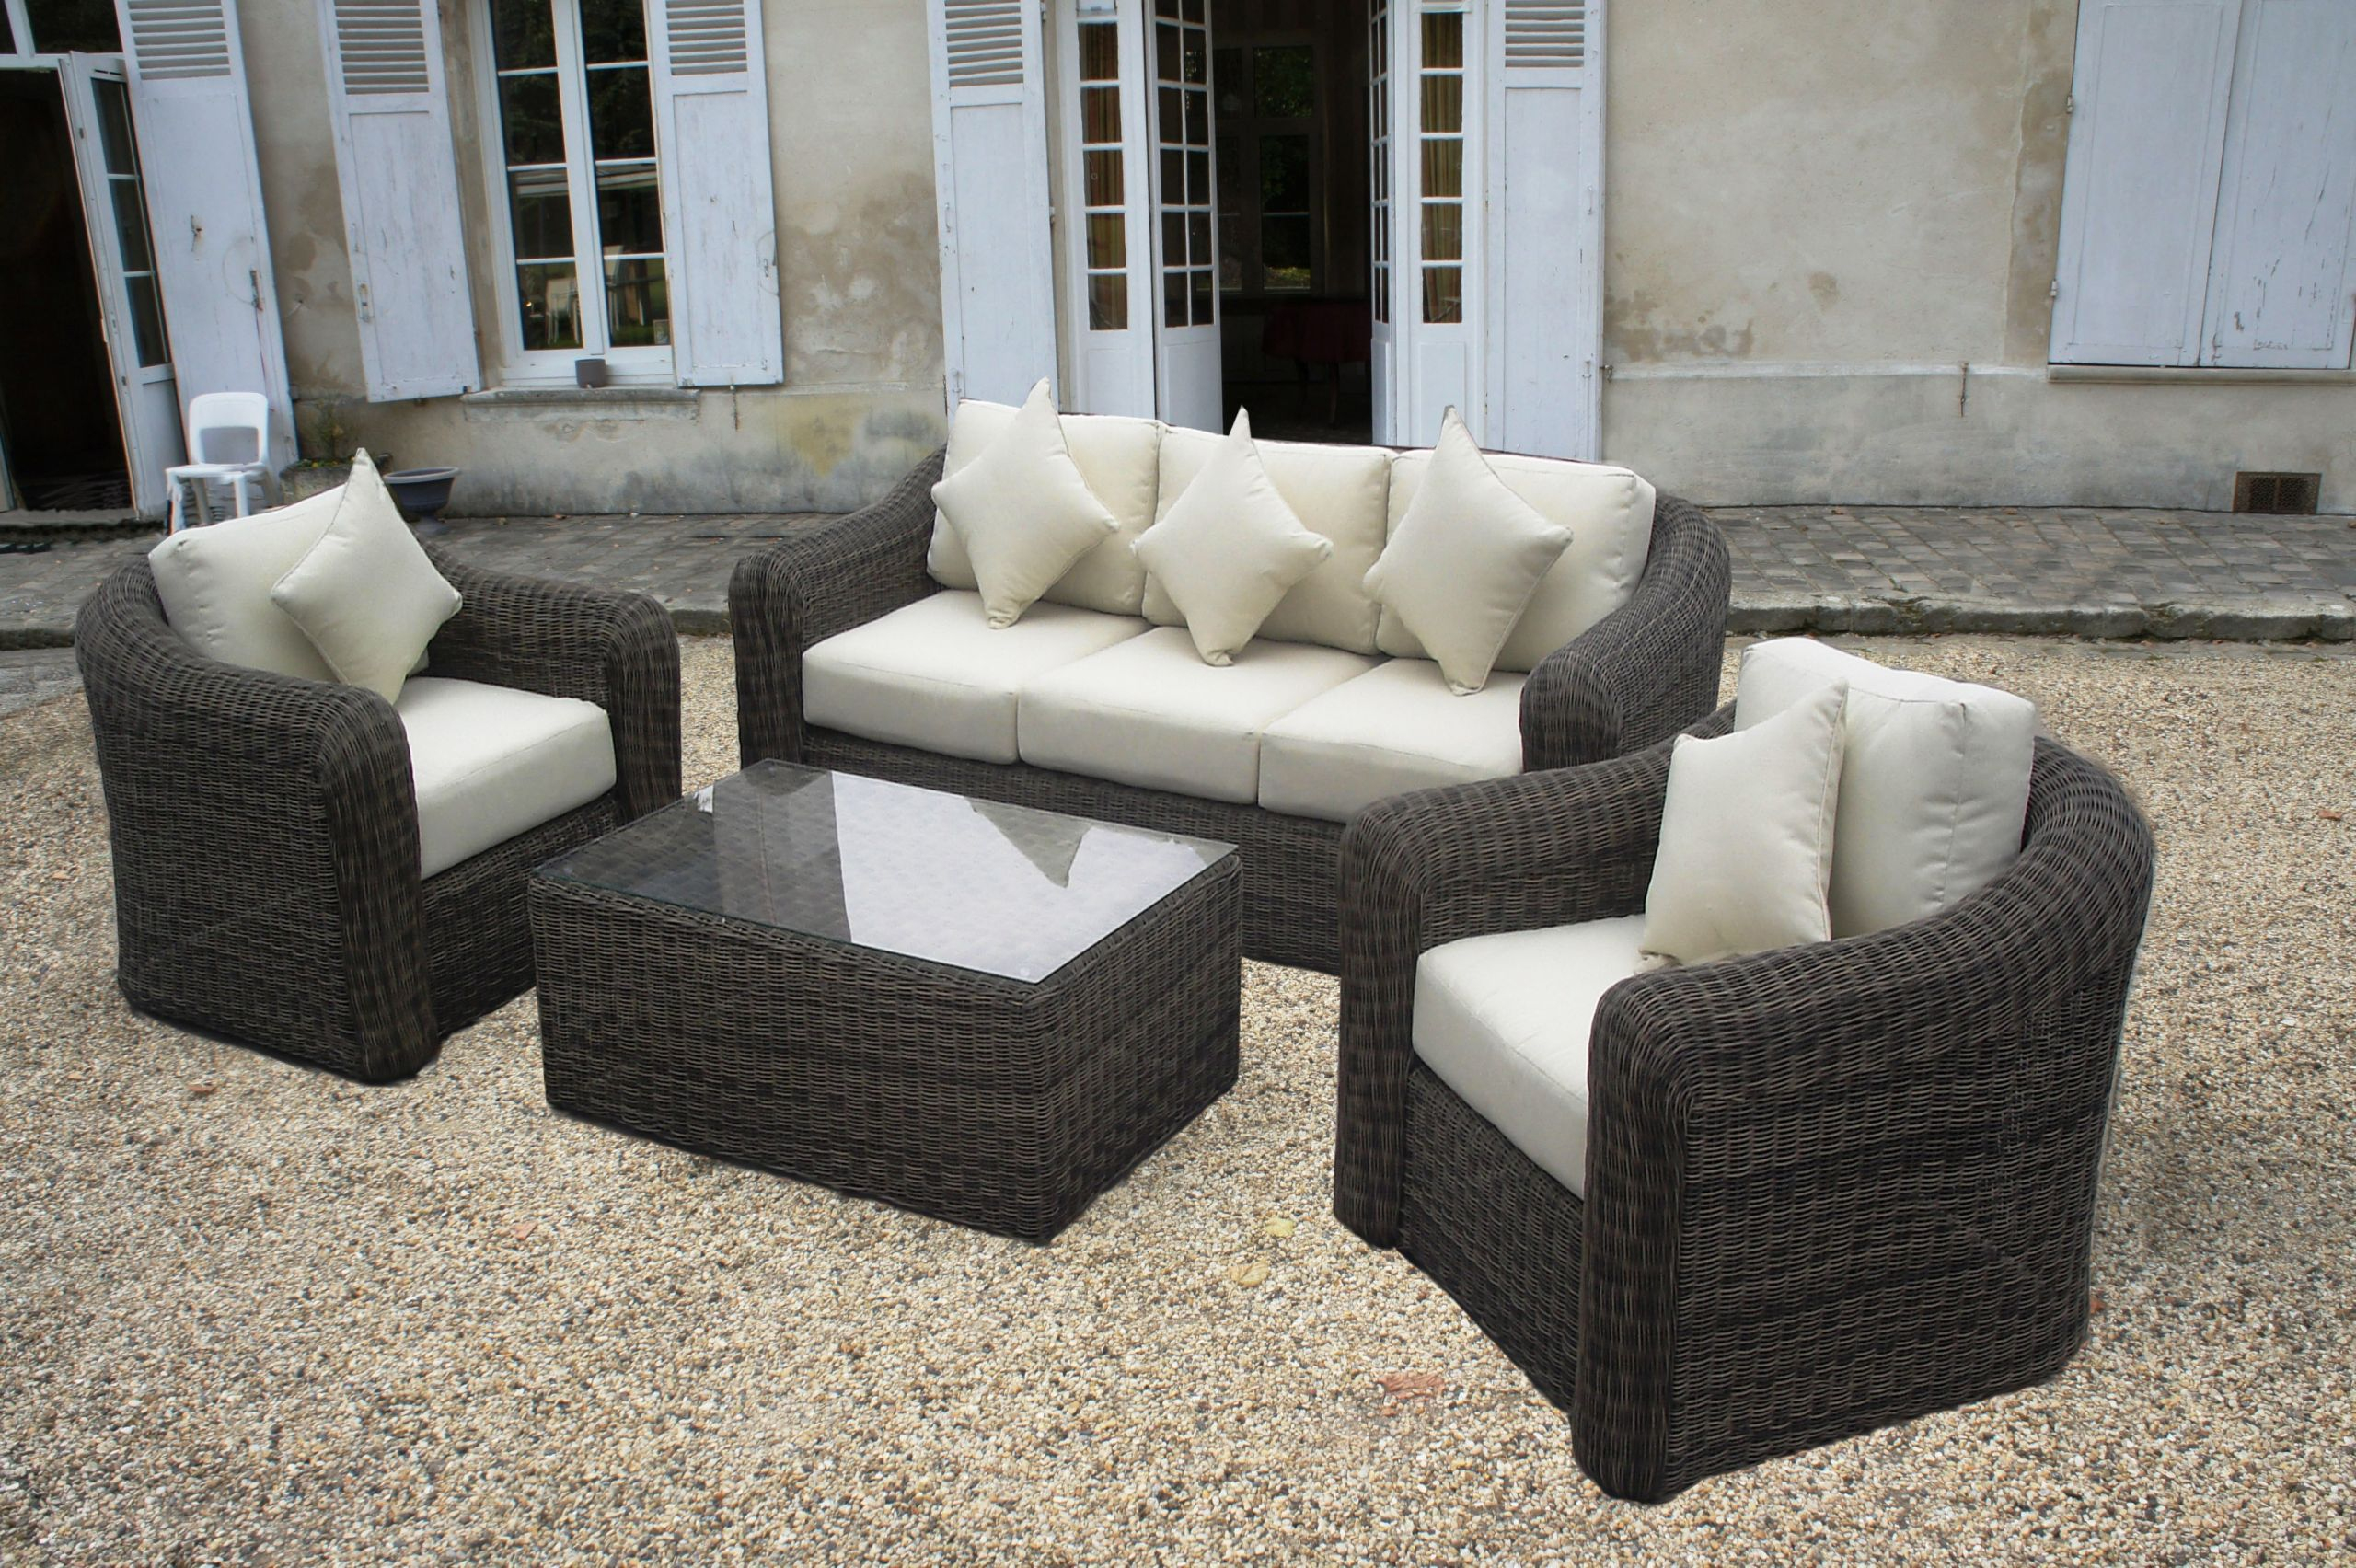 Salon De Jardin Design En Solde Concept - Idees Conception ... encequiconcerne Soldes Salon De Jardin Leclerc